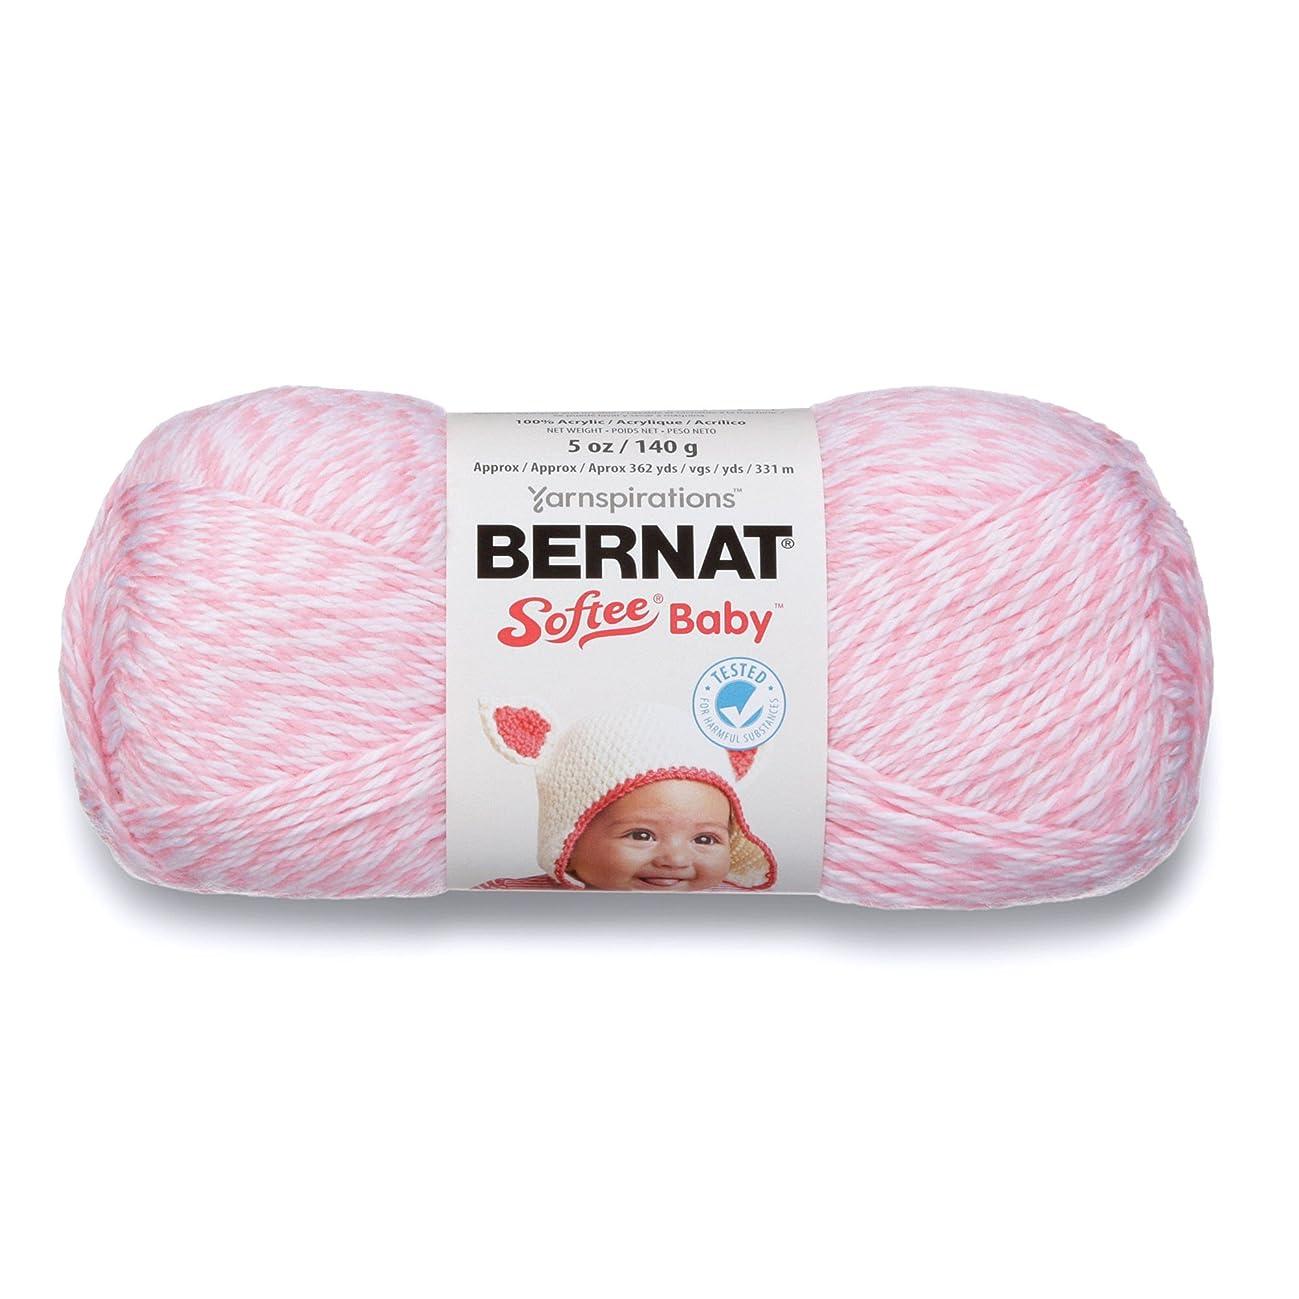 Bernat Softee Baby Yarn, 5 oz, Gauge 3 Light, Baby Pink Marl